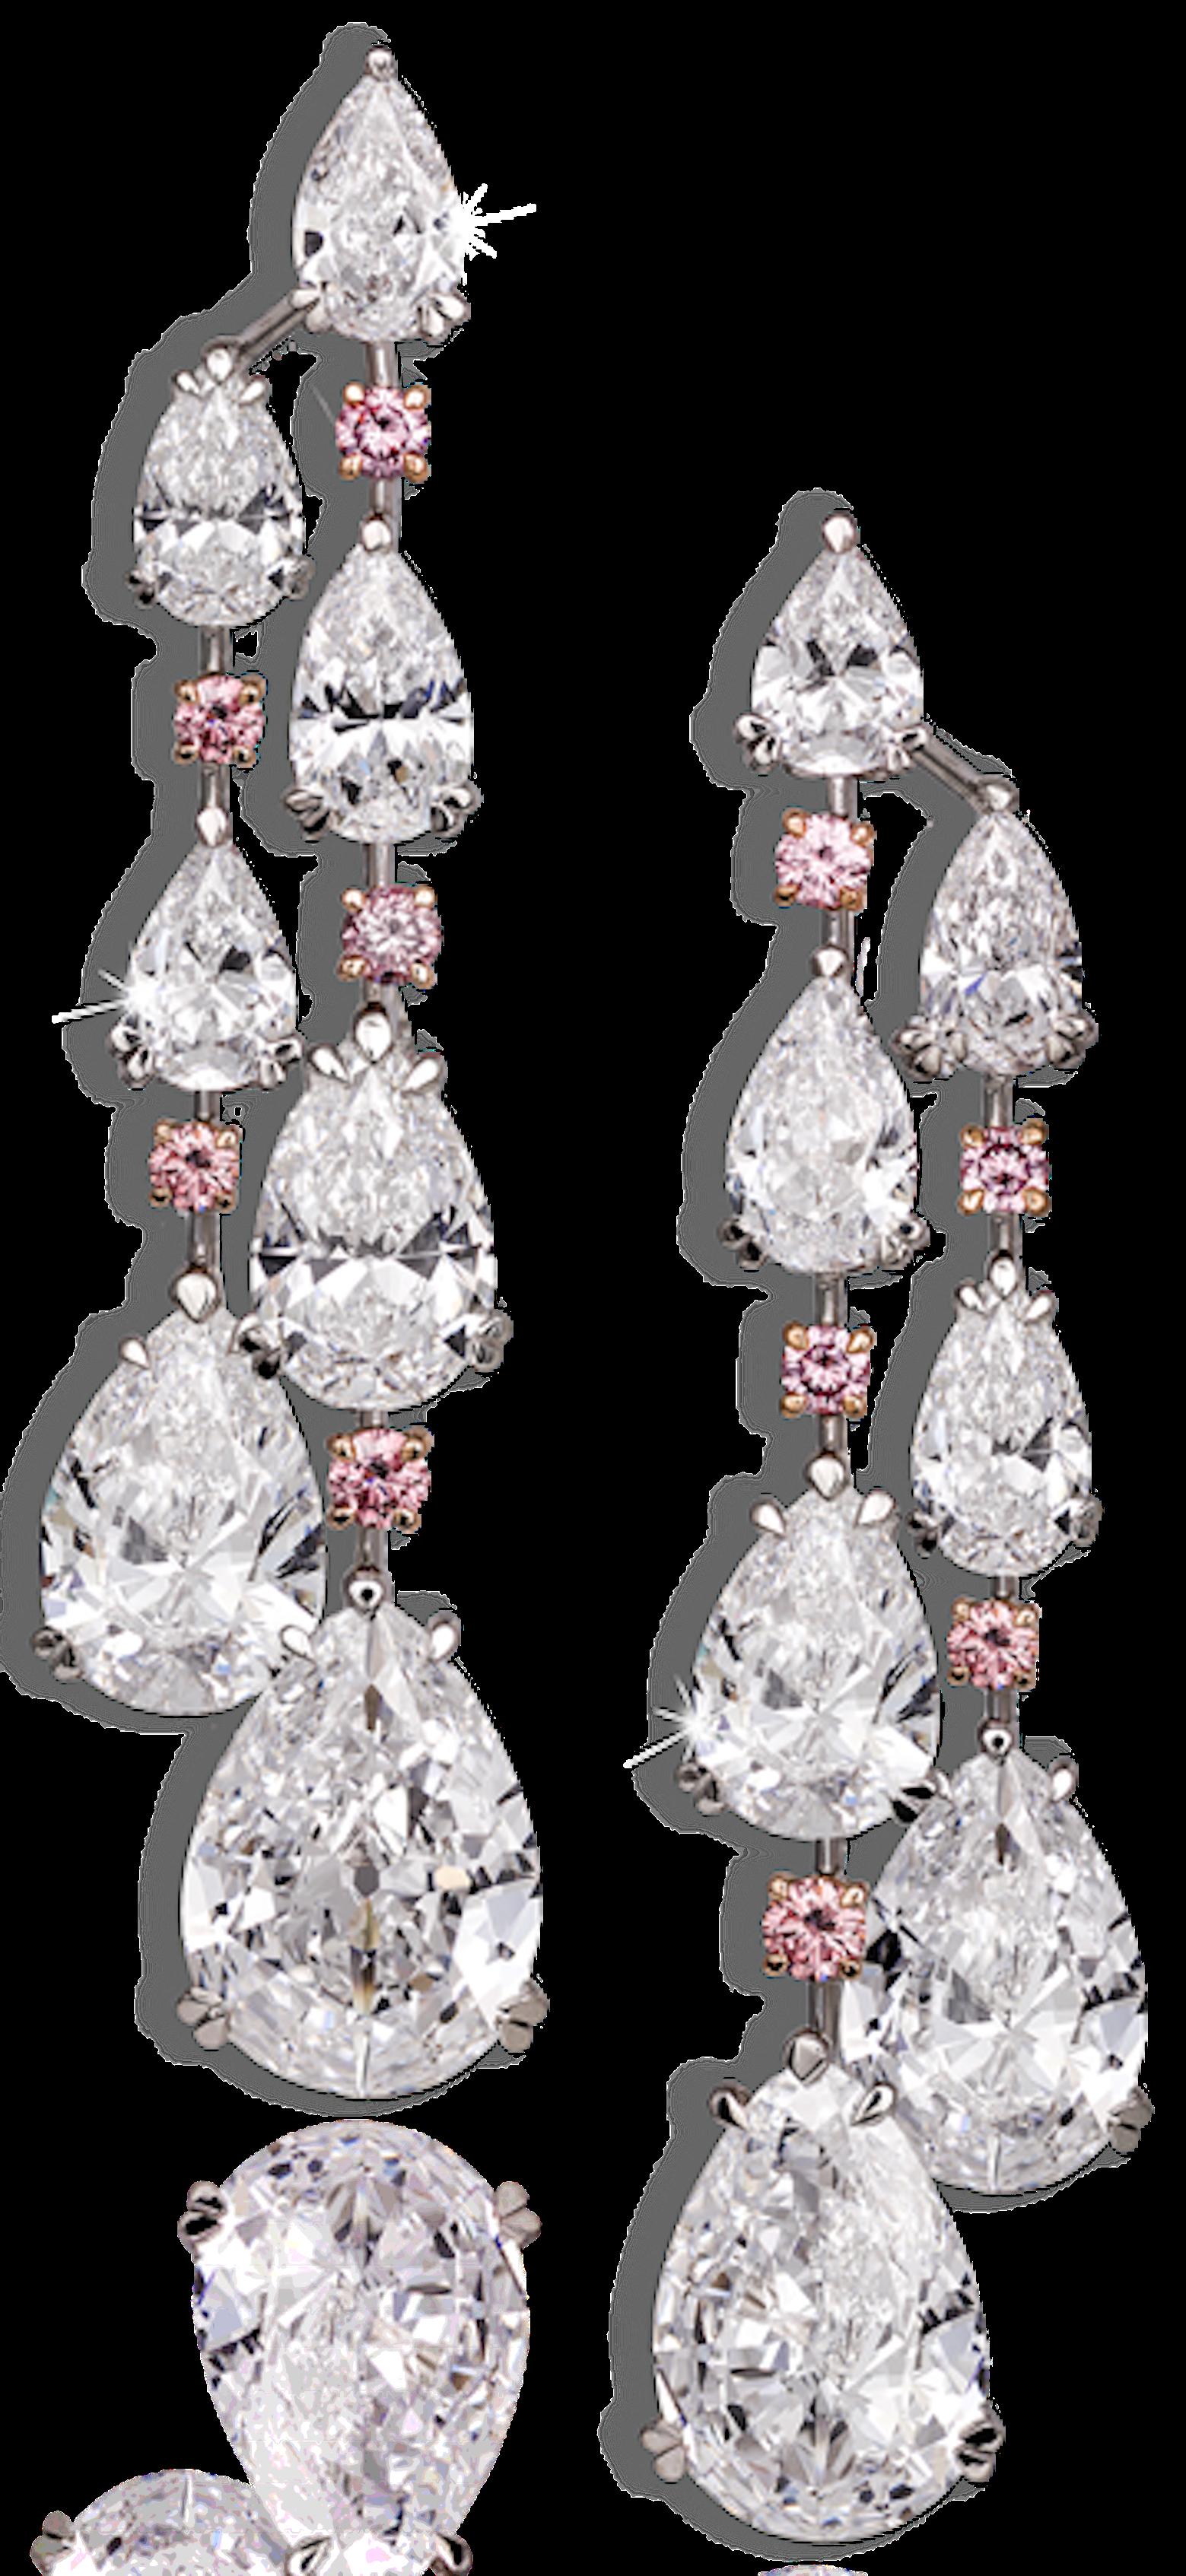 David Morris | Important white diamond chandelier earrings ...:David Morris | Important white diamond chandelier earrings comprising D/IF  pear shapes with vivid,Lighting